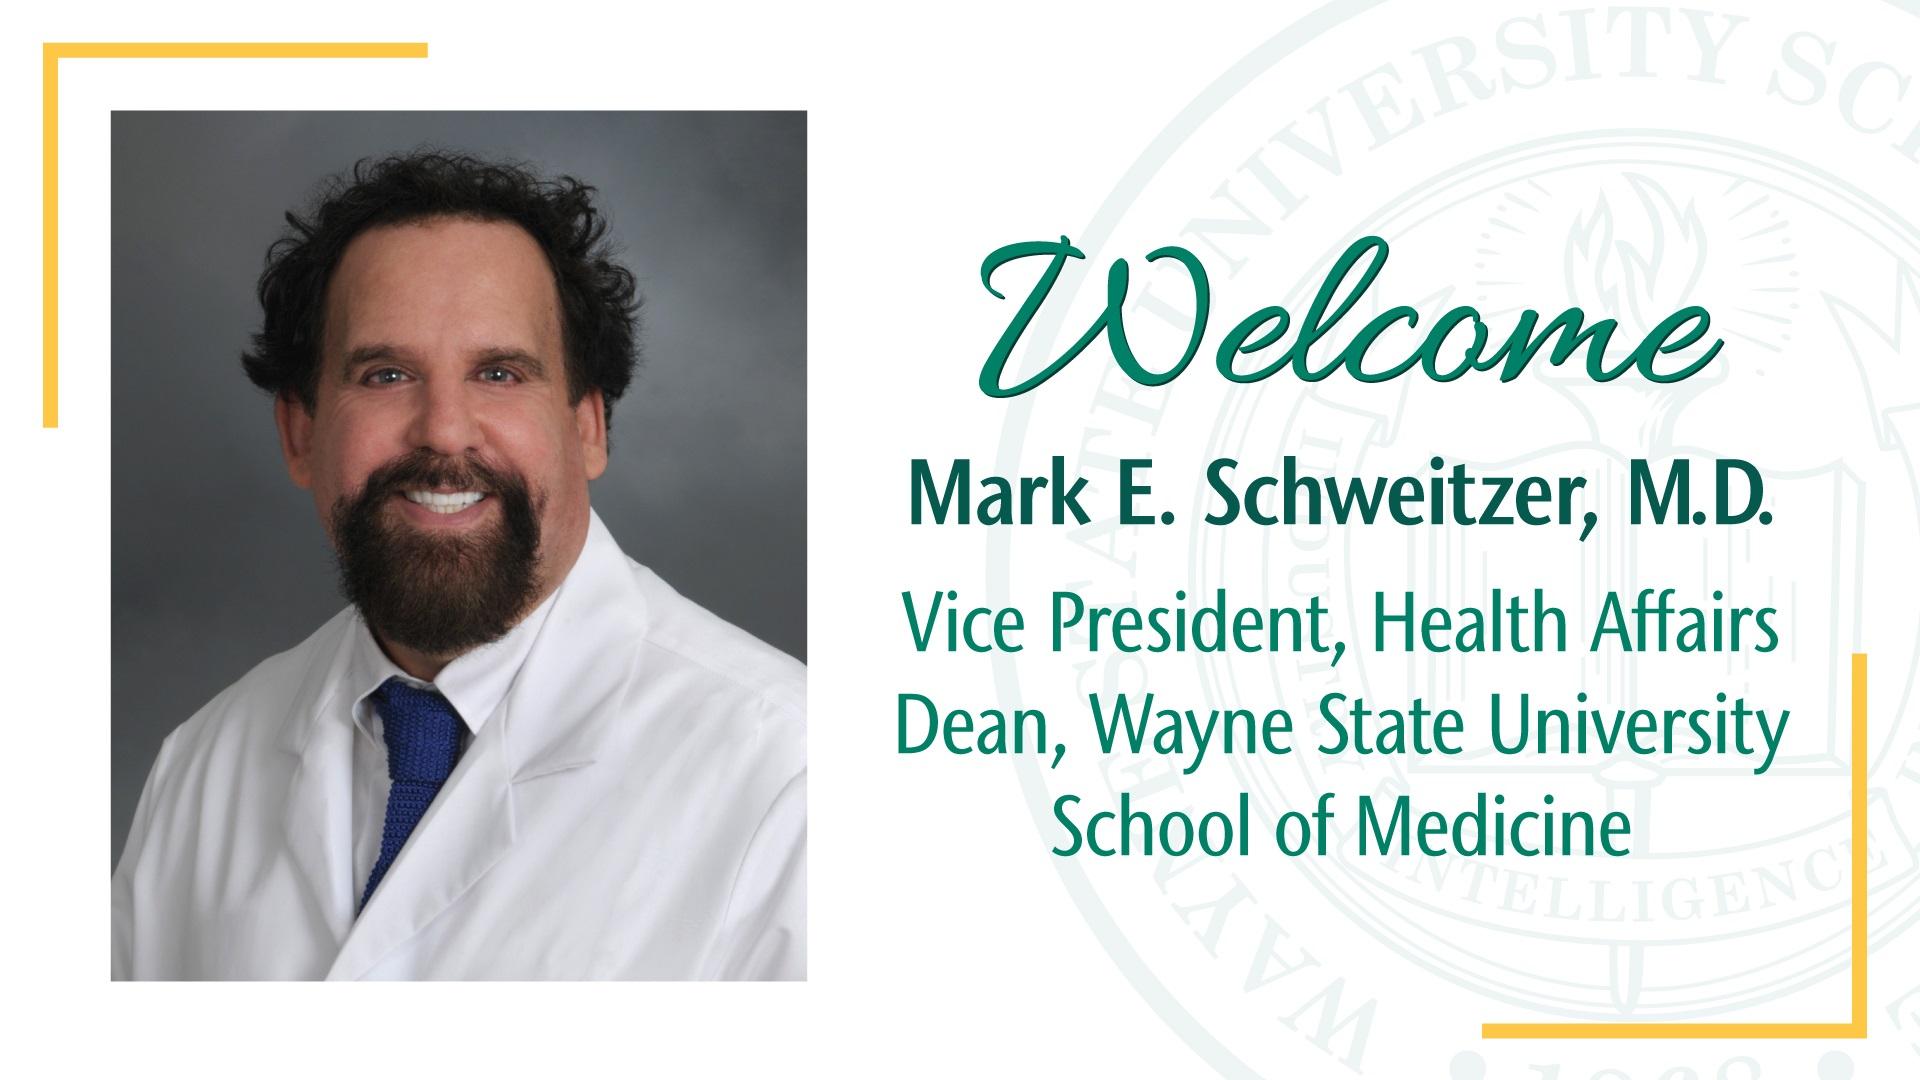 Mark Schweitzer, M.D.